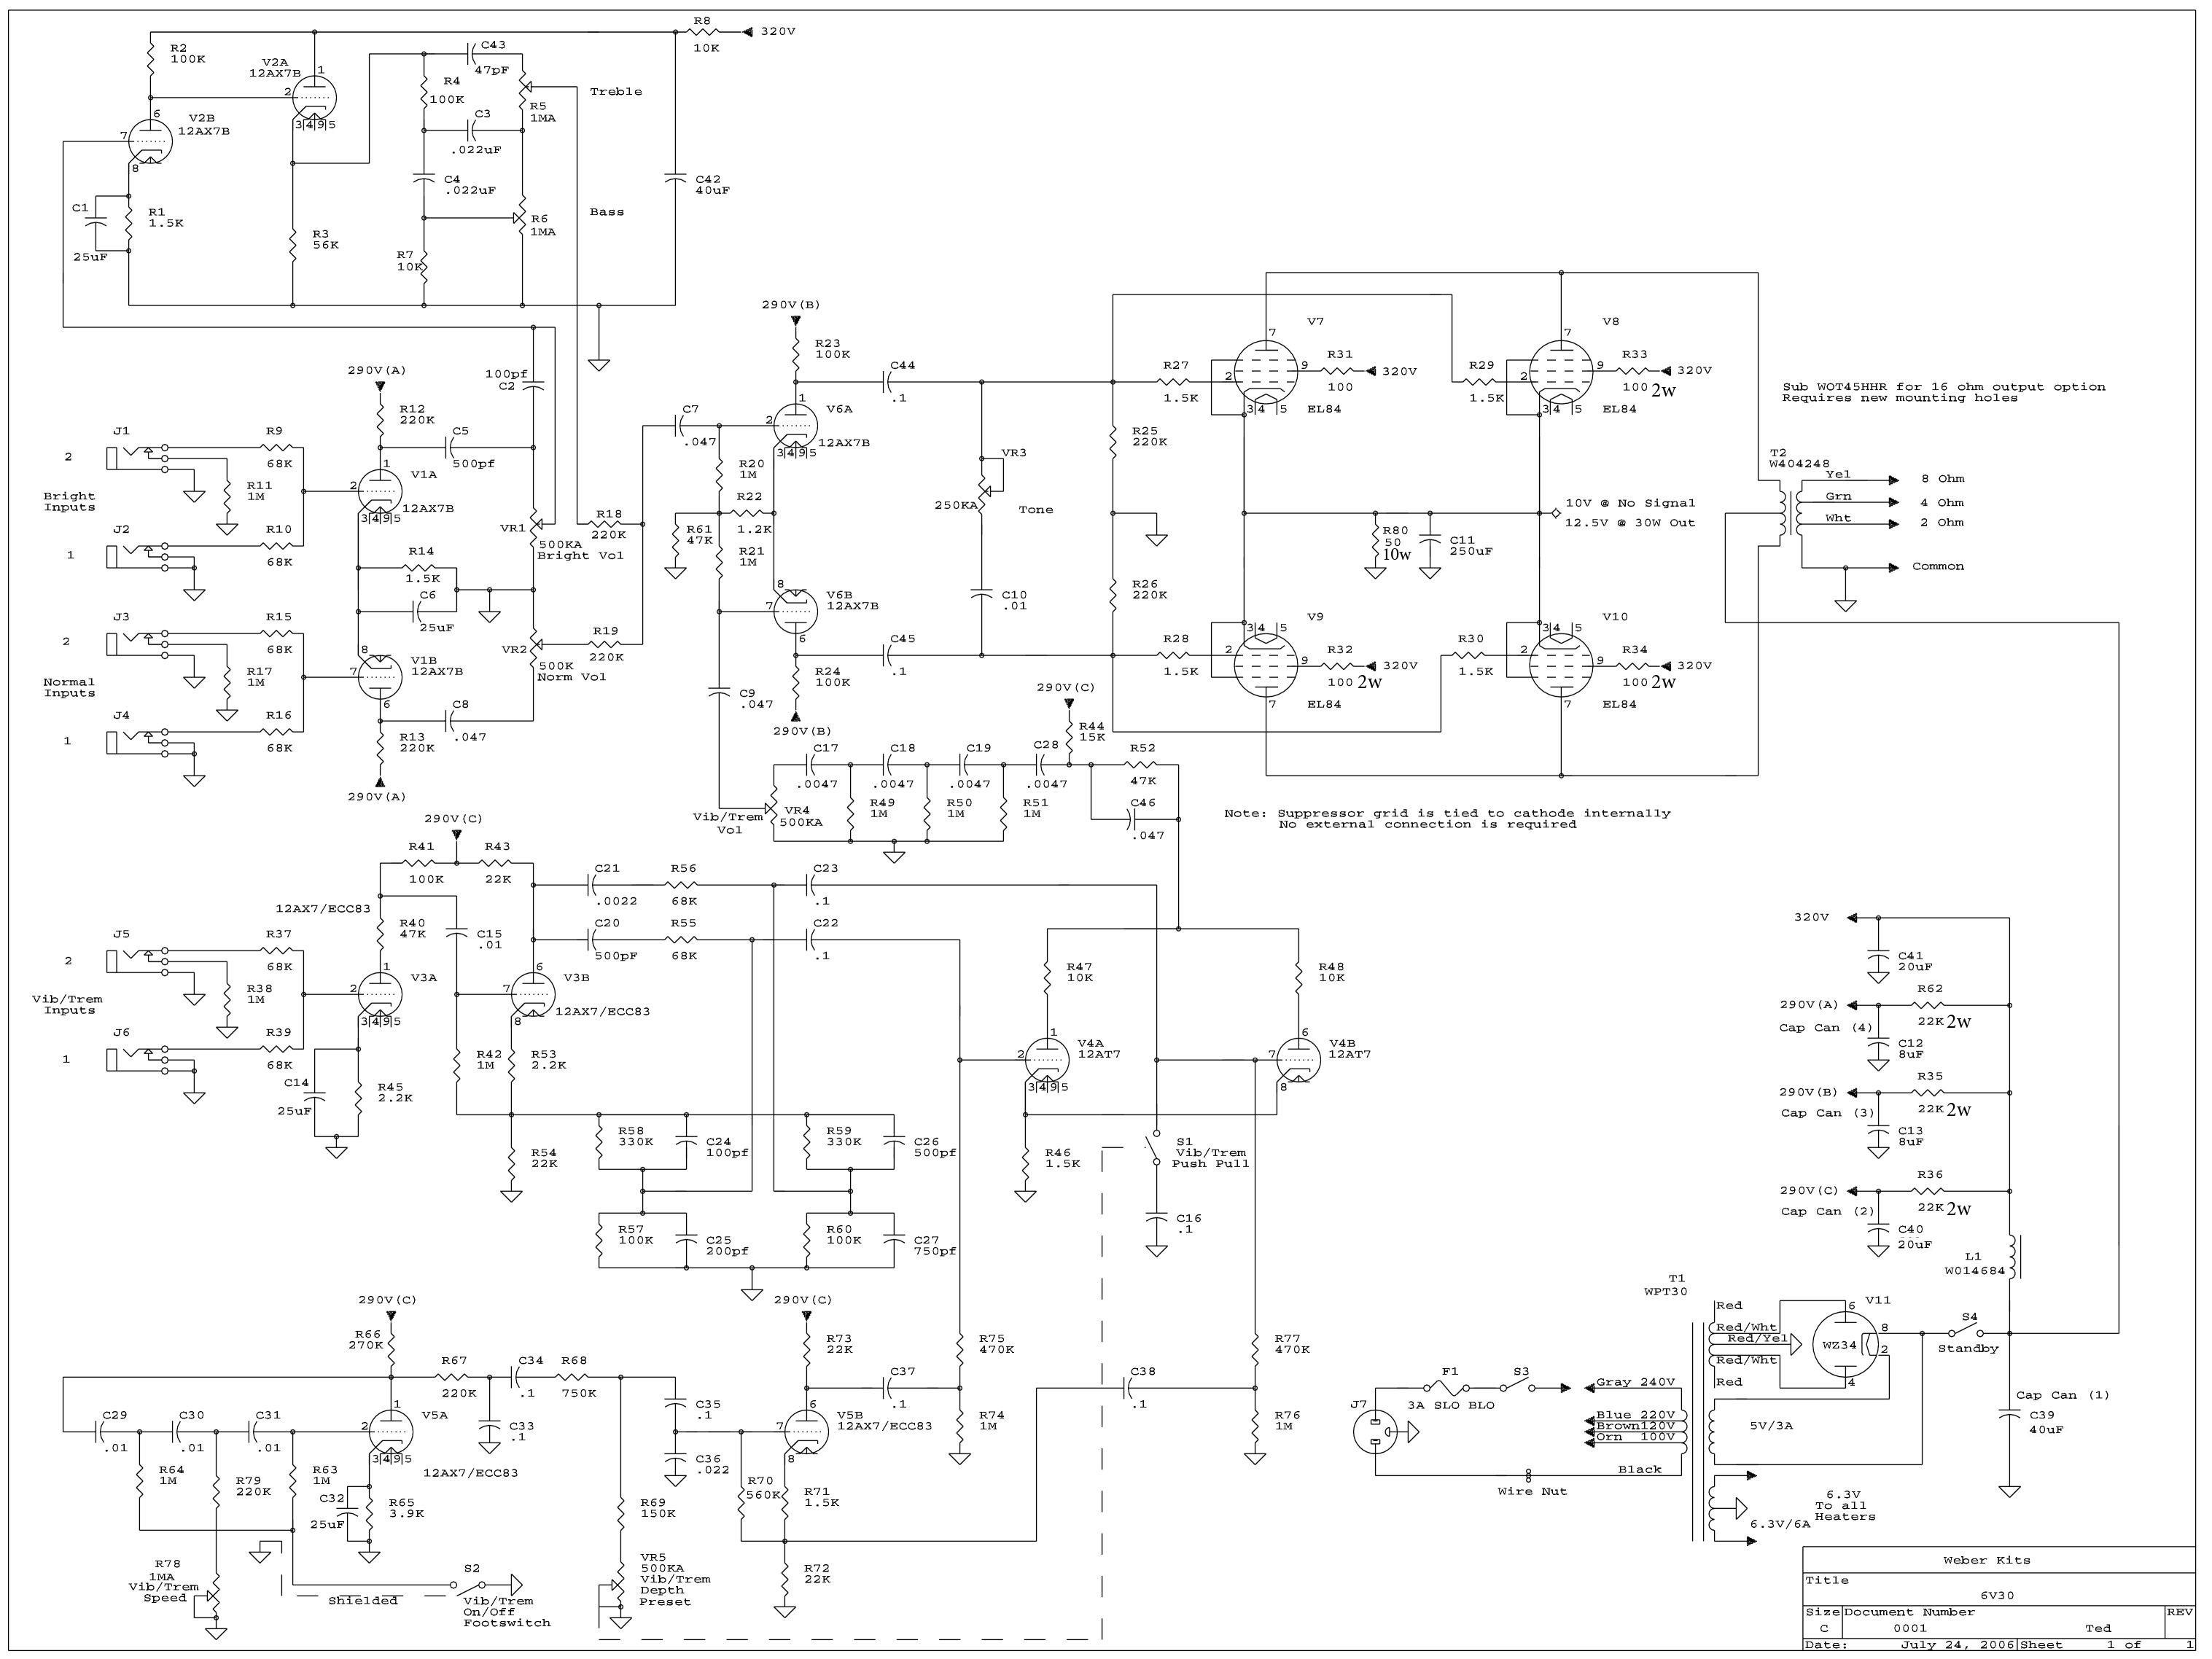 6v30 kit 6v30 schem 6v30 kit weber ksg 470 wiring diagrams at crackthecode co